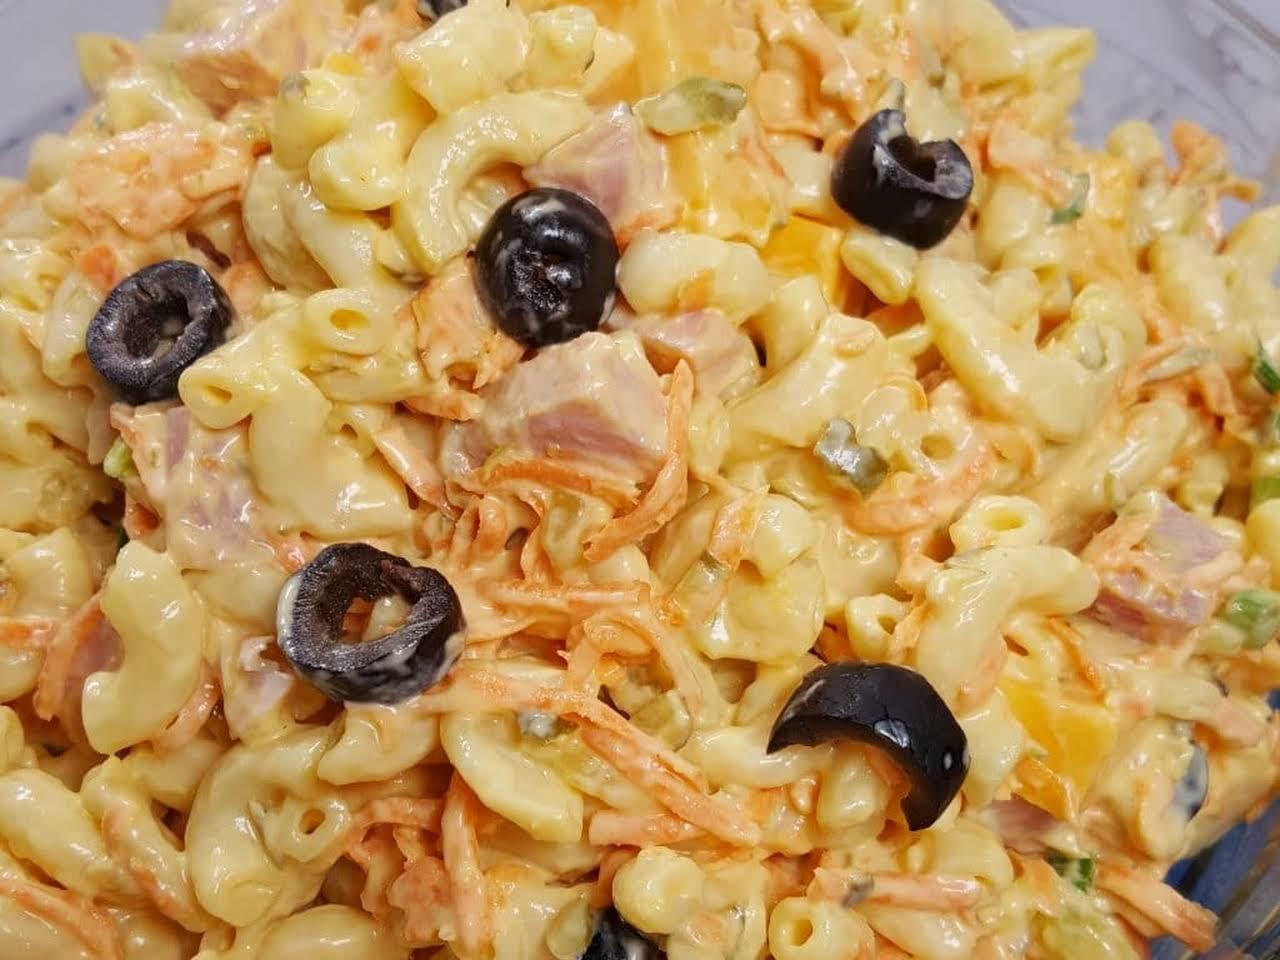 Macaroni Salad Recipe With Olives